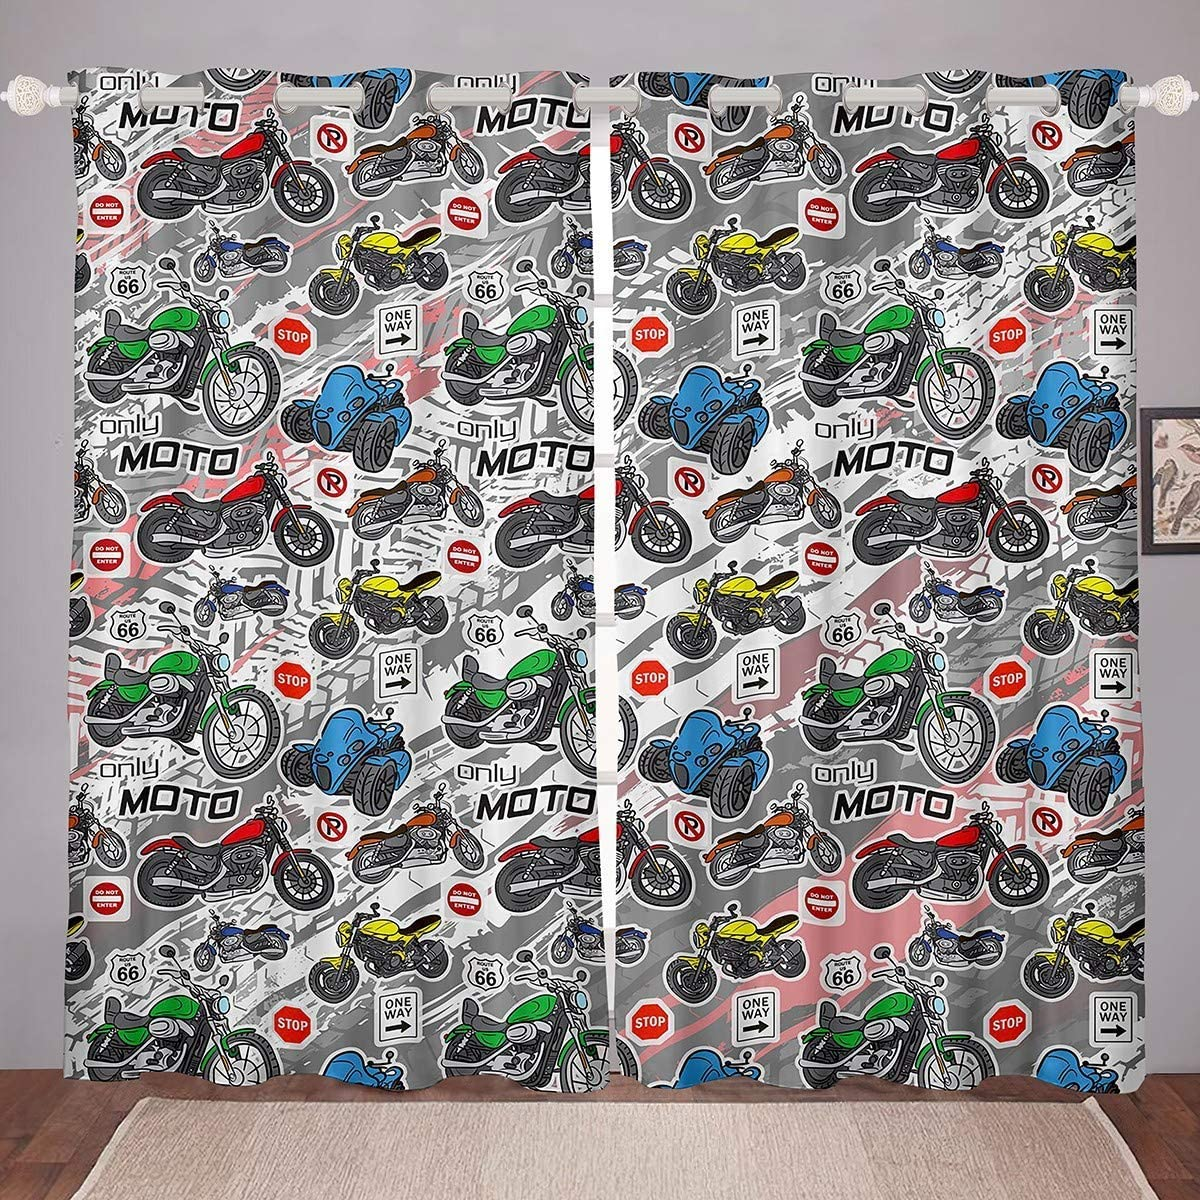 Popular standard Boys Motocross Curtains Great interest Extreme Sports f Window Theme Treatments